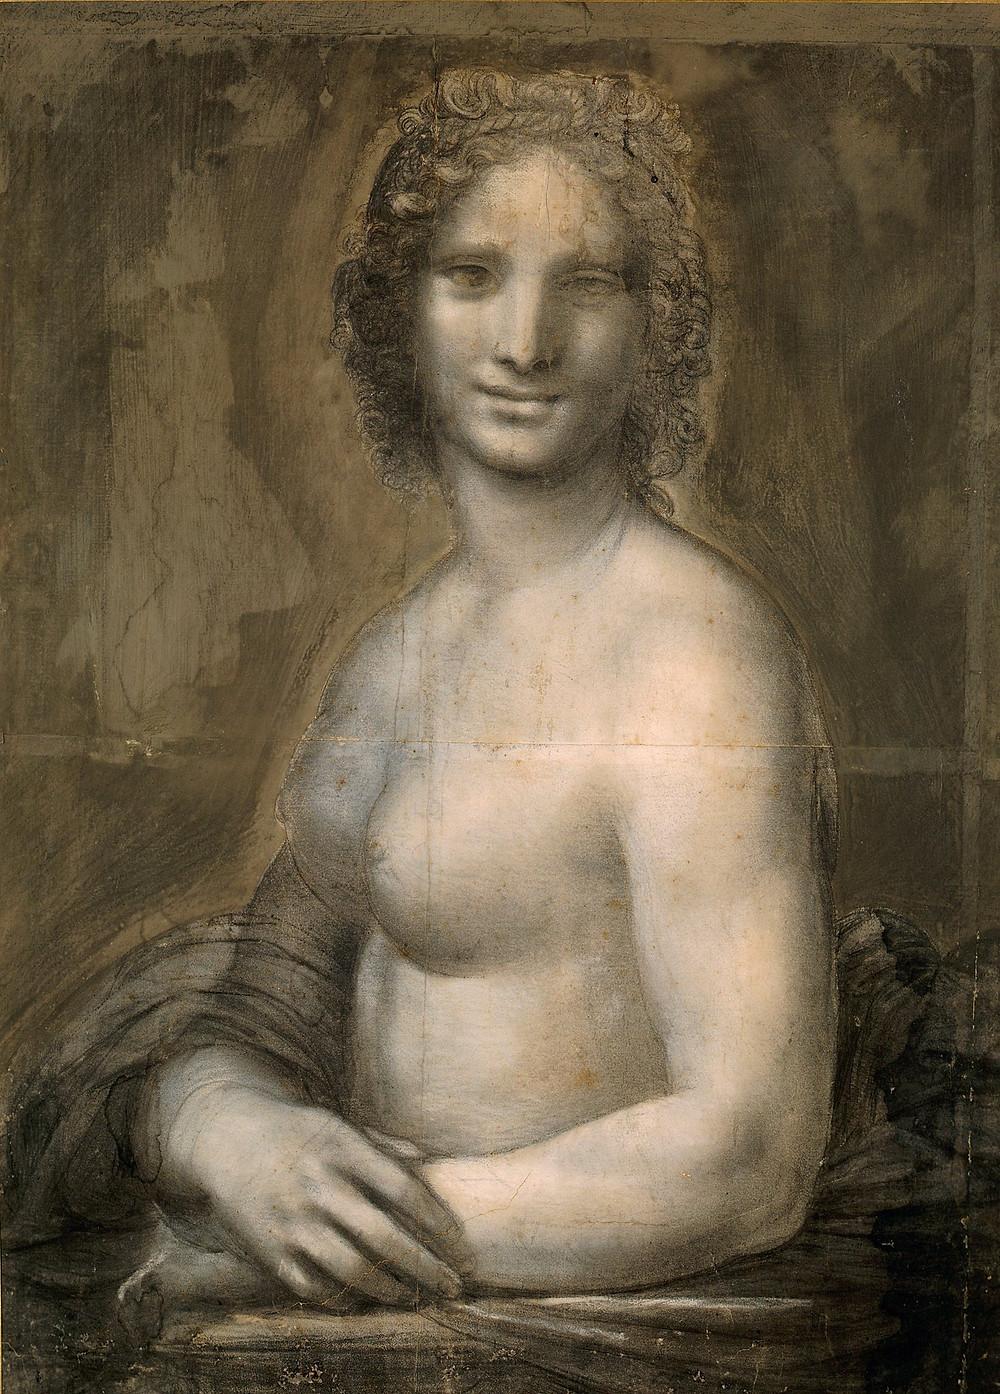 The Mona Vanna